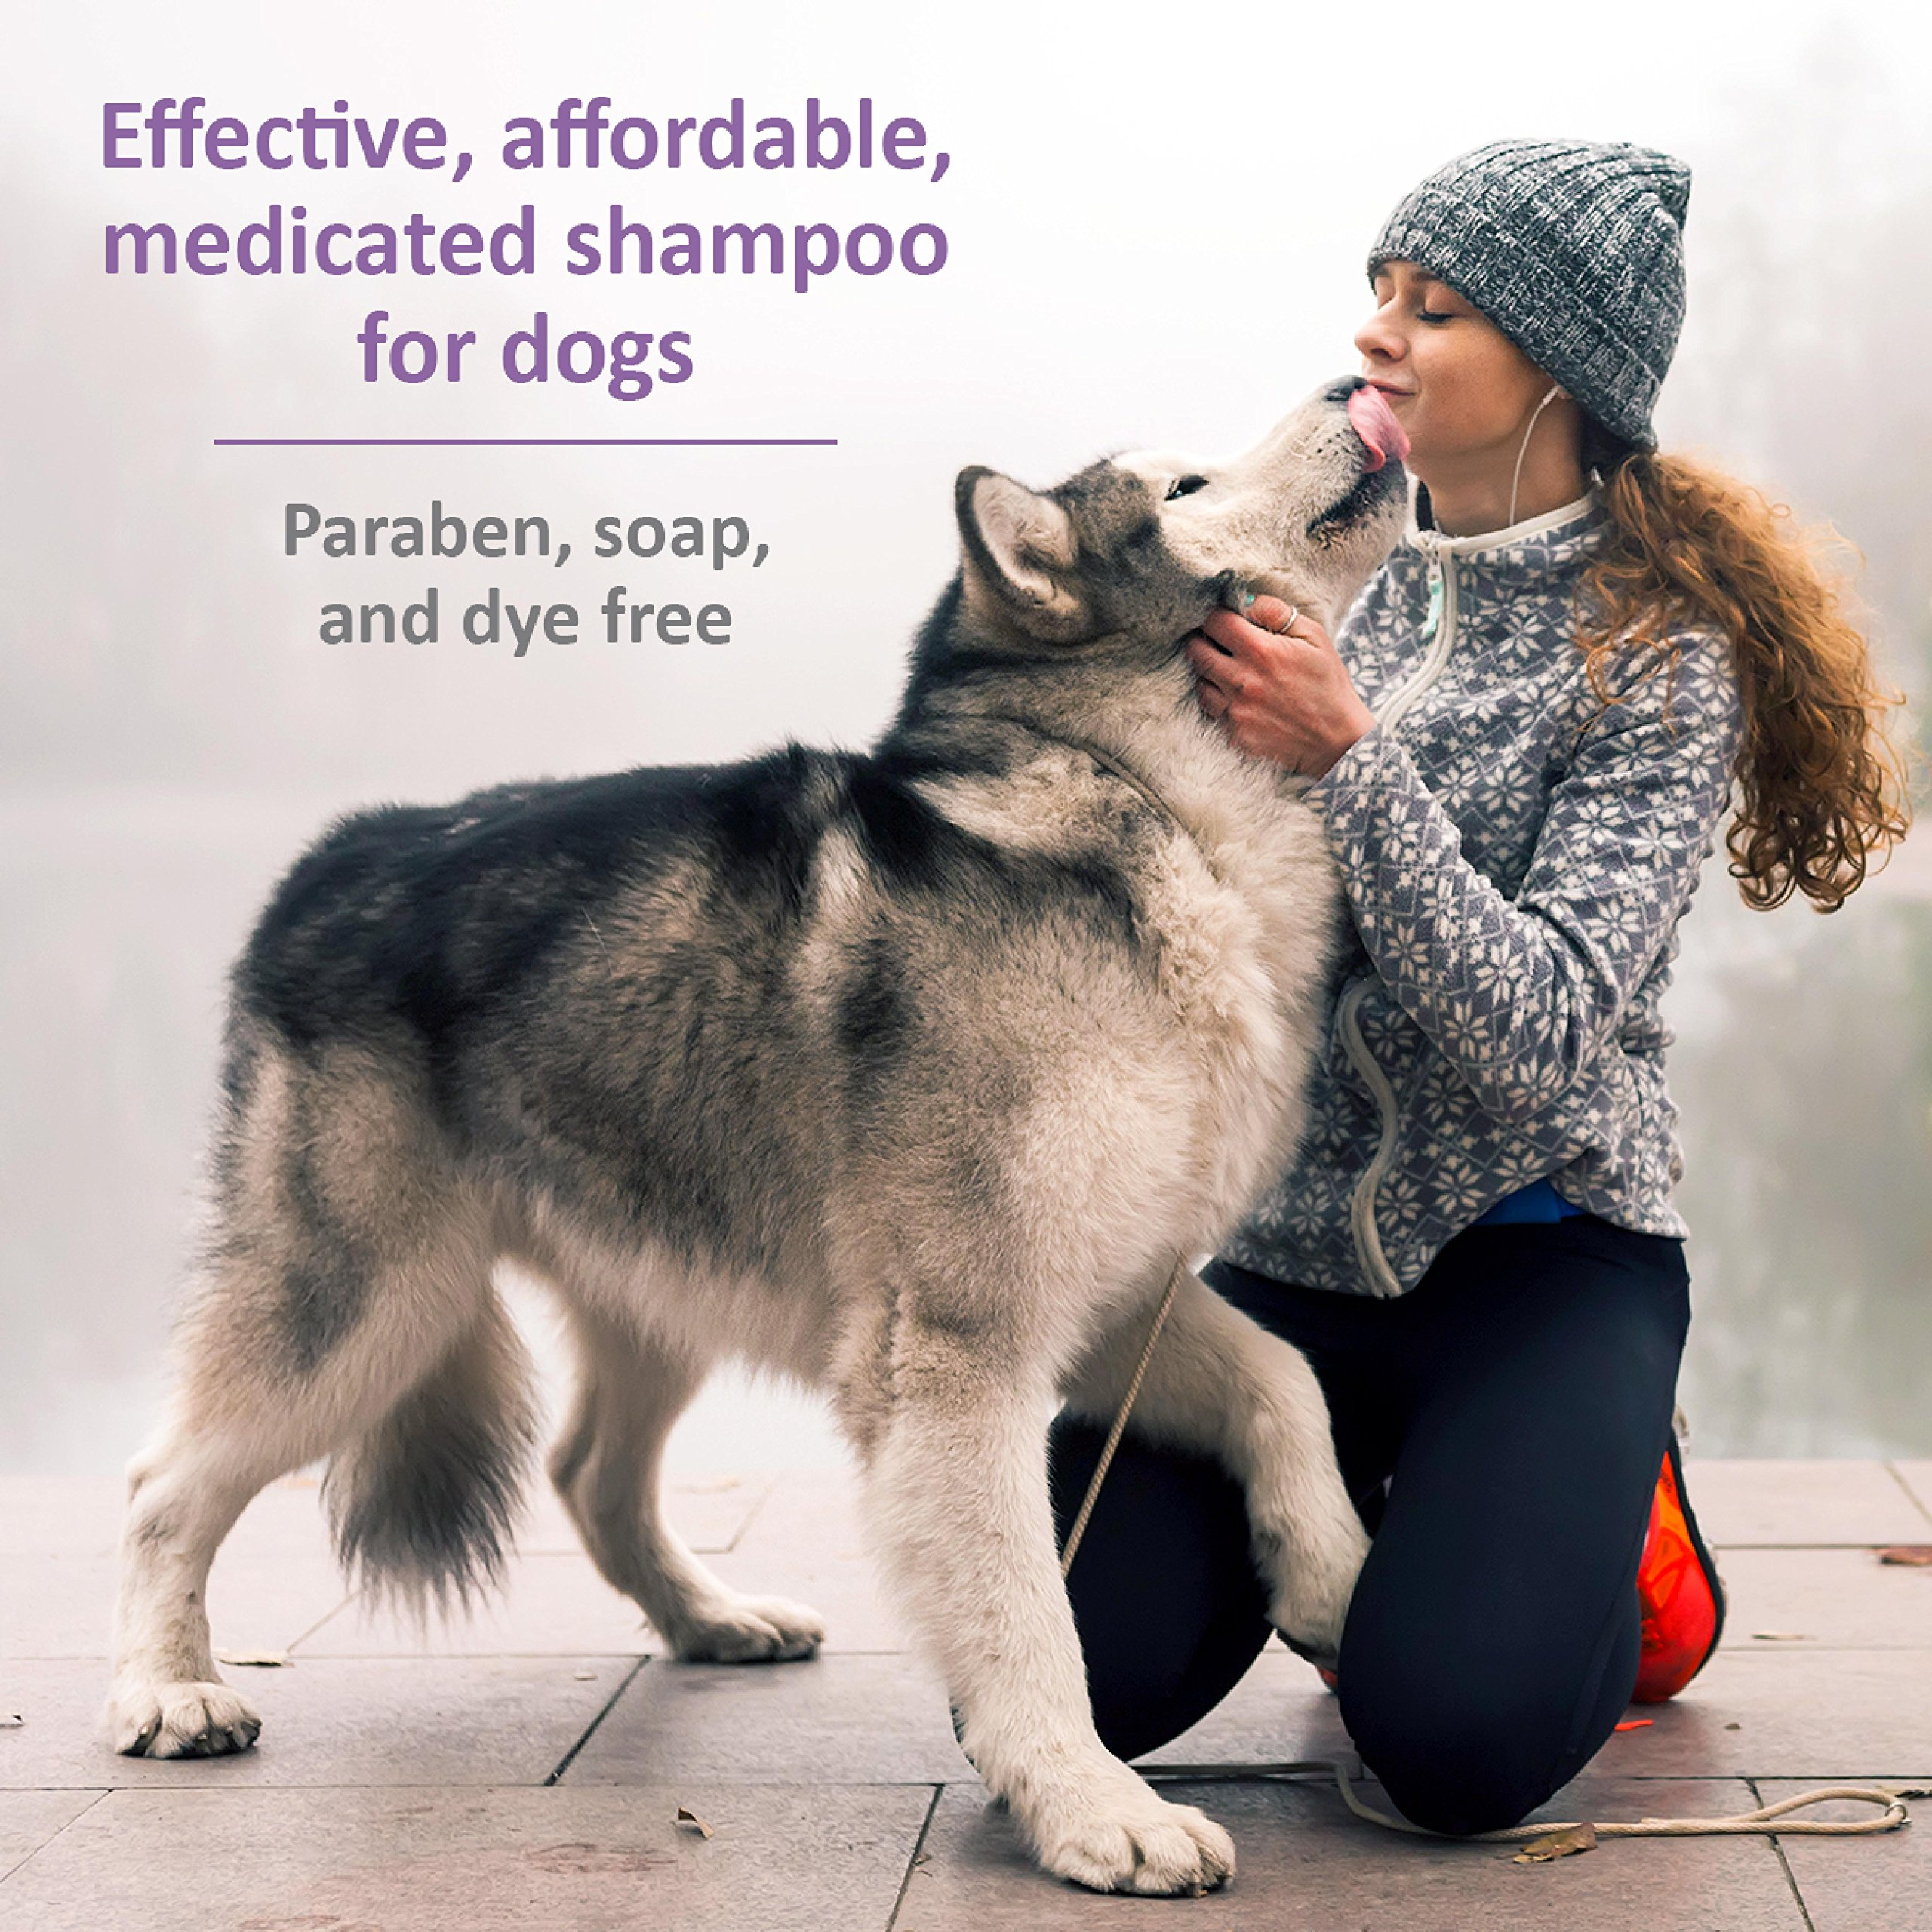 SynergyLabs Veterinary Formula Clinical Care Antiparasitic & Antiseborrheic  Medicated Shampoo for Dogs